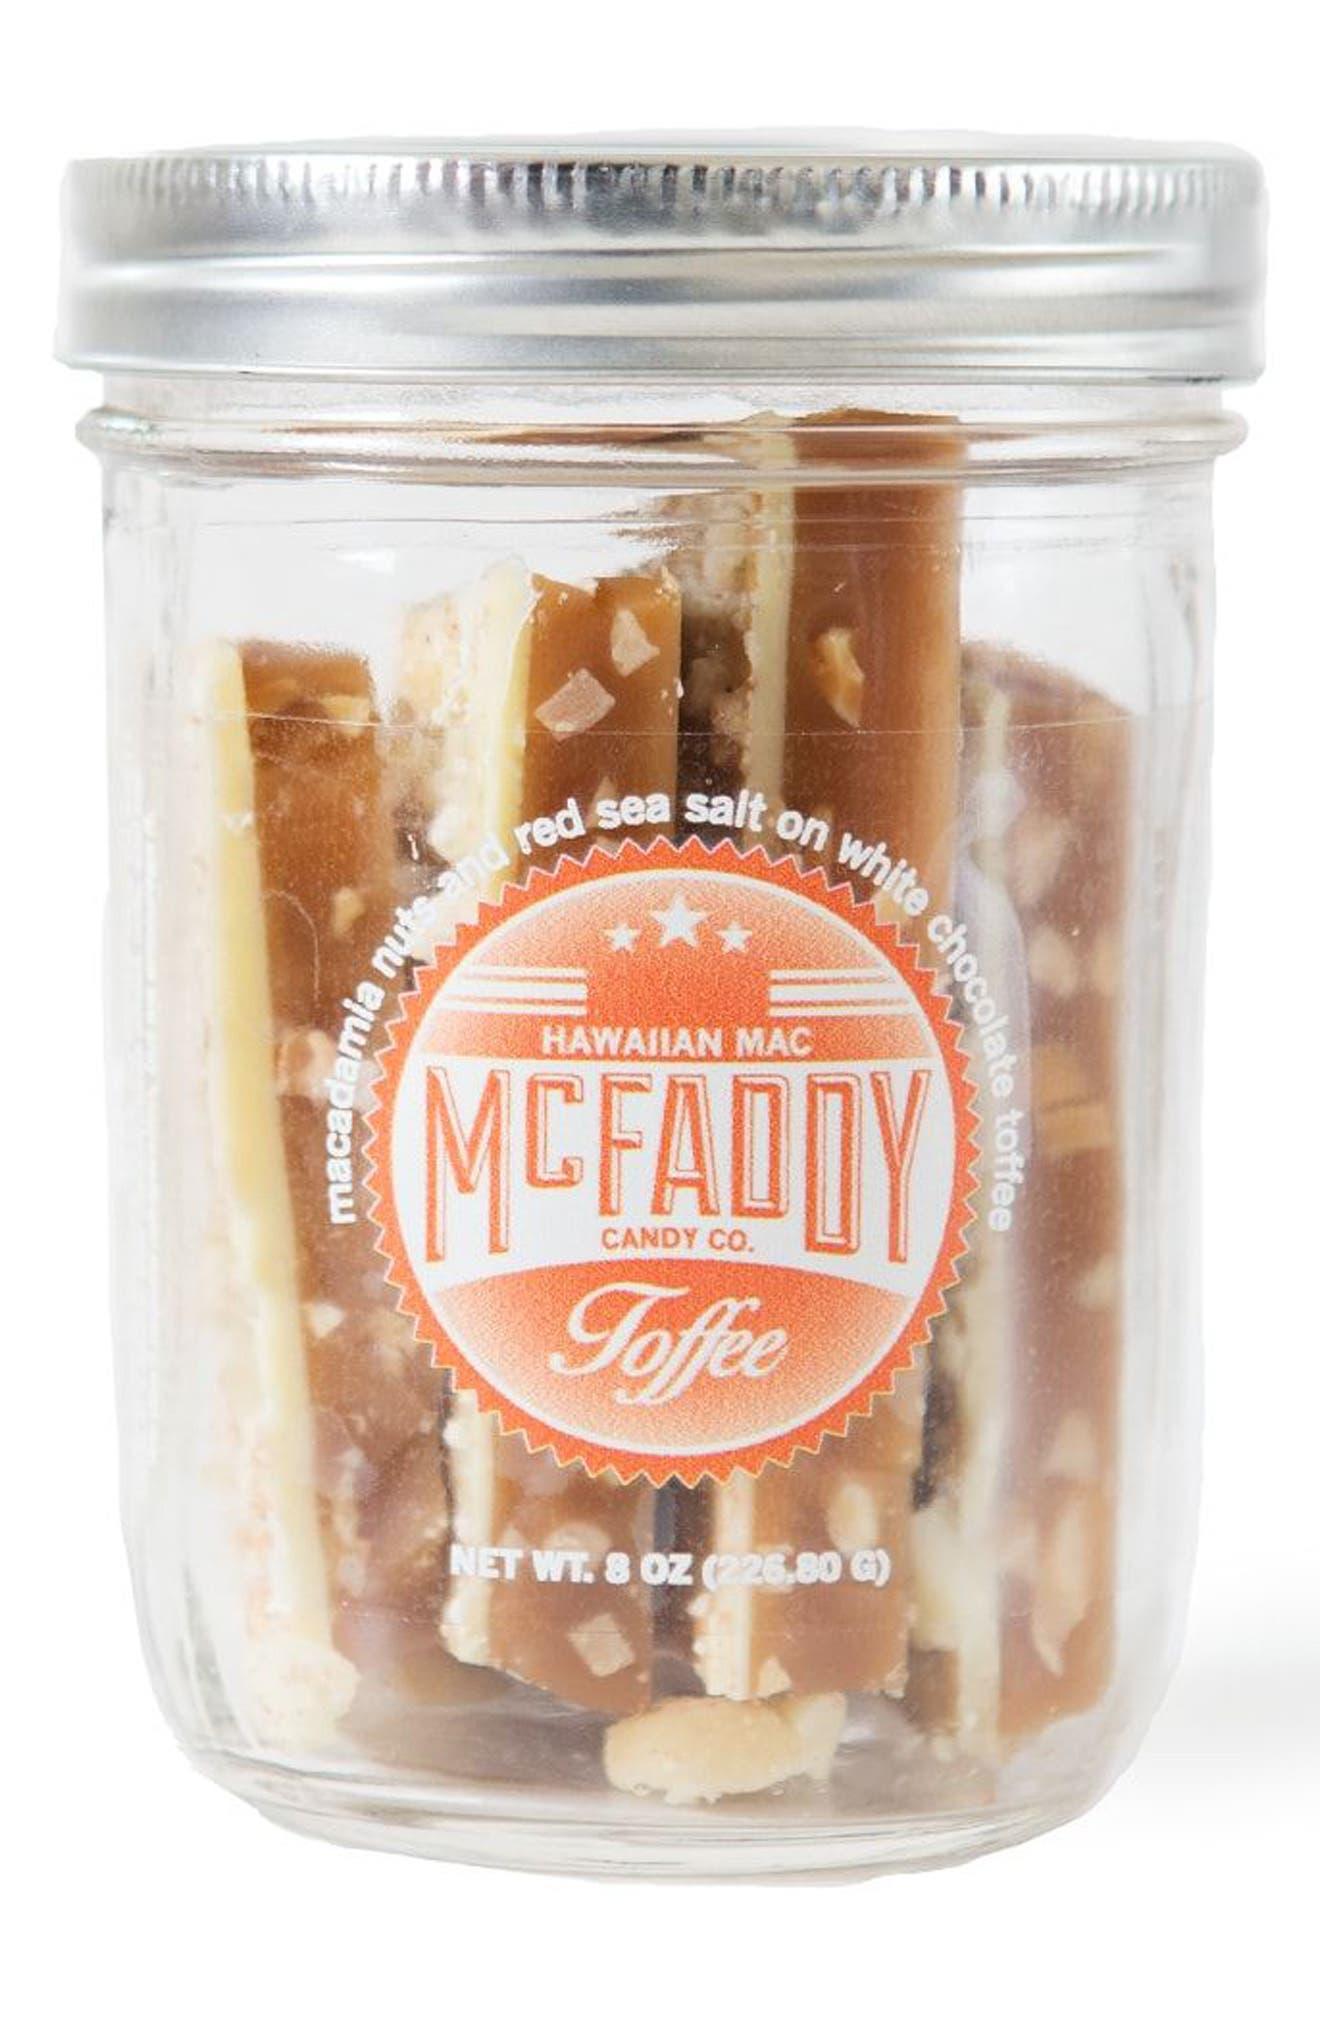 Main Image - McFaddy Candy Hawaiian Mac